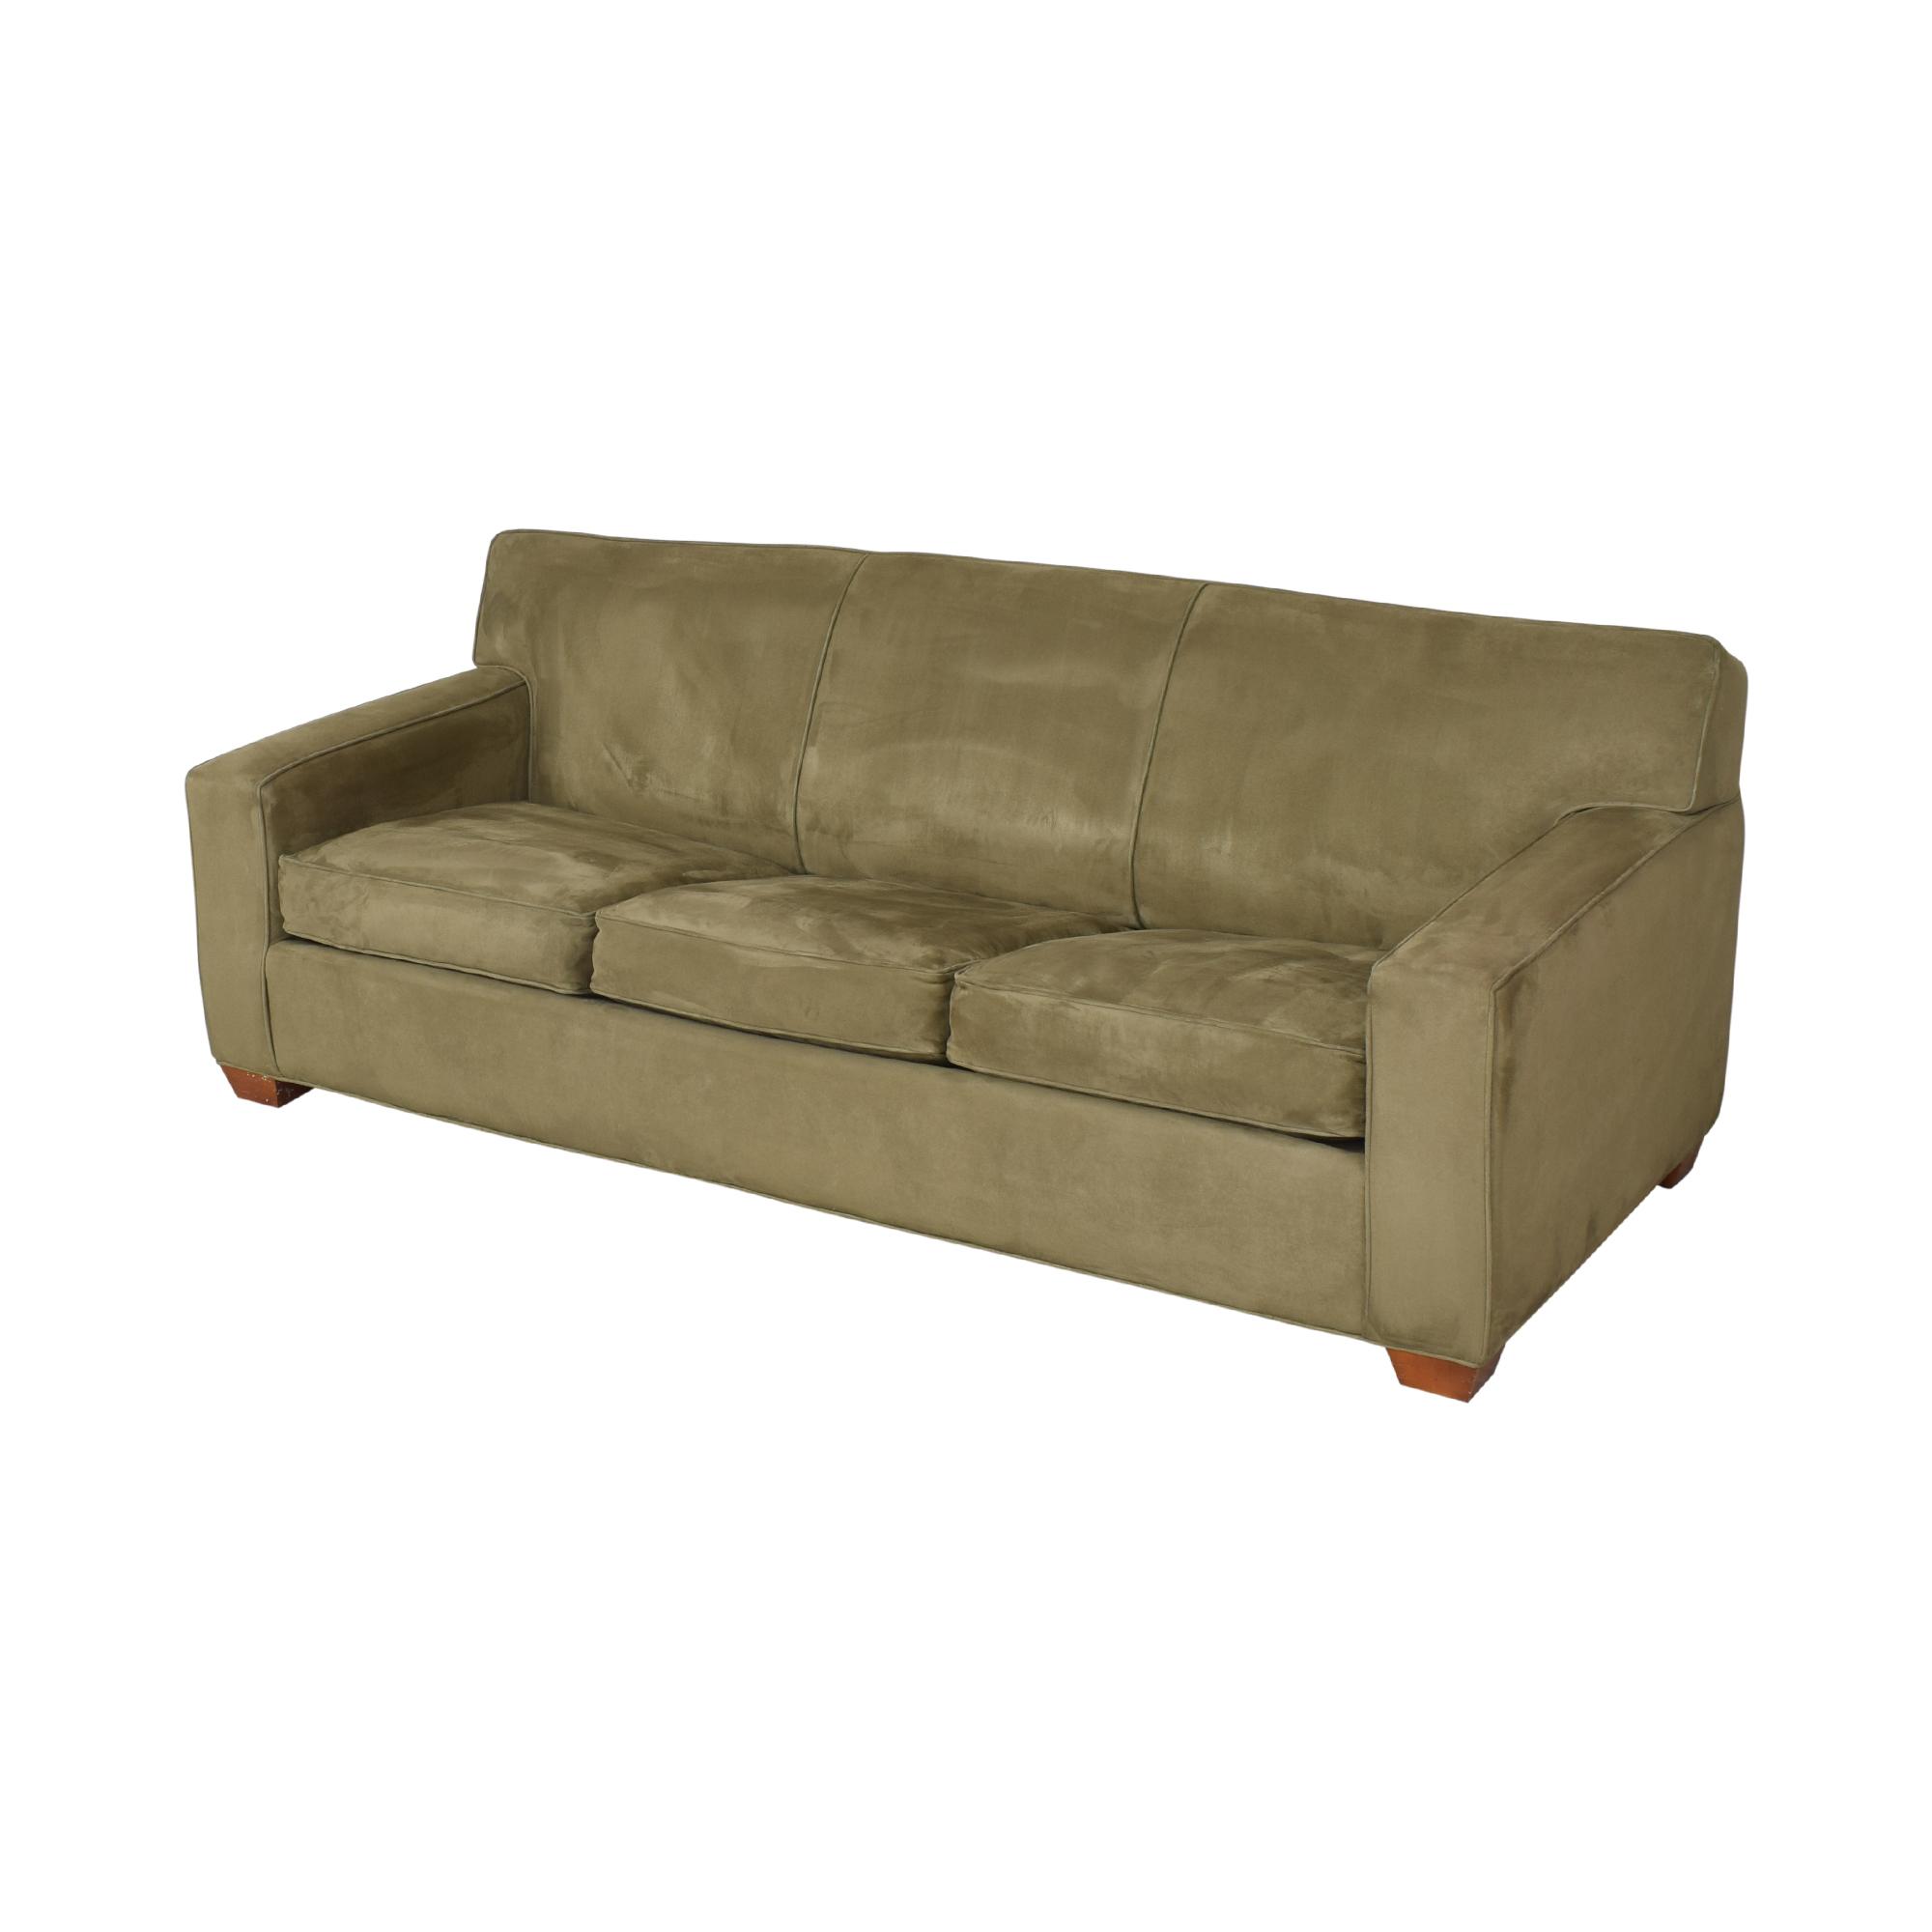 Crate & Barrel Crate & Barrel Three Cushion Sleeper Sofa  used